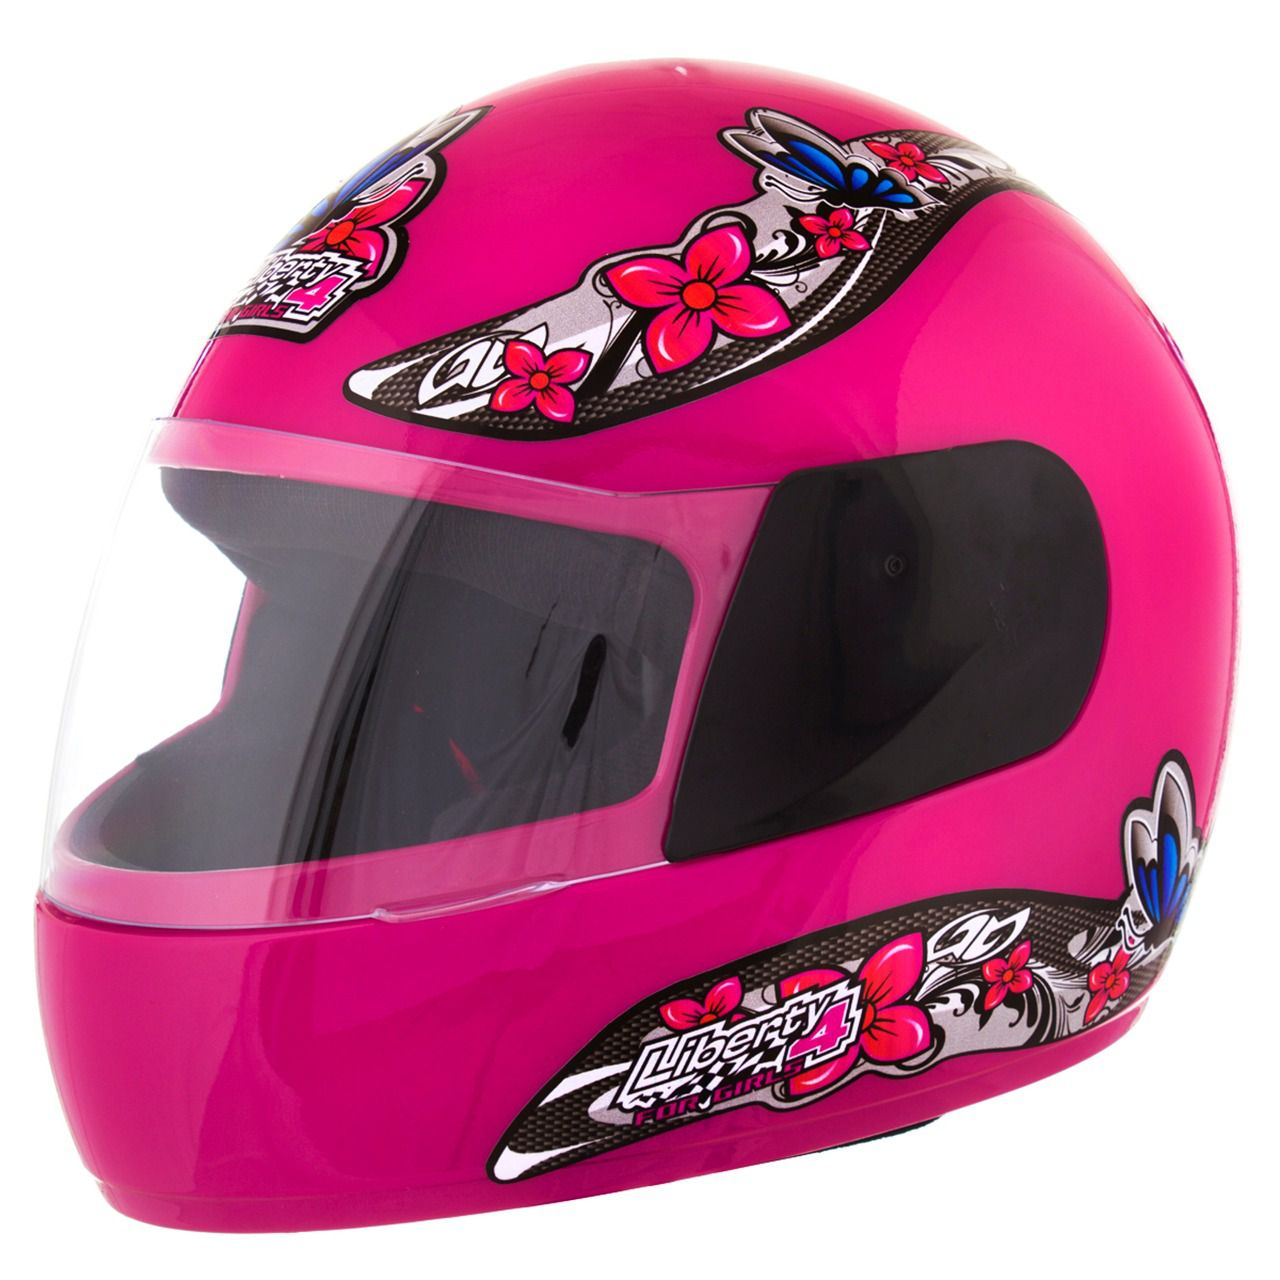 Capacete Feminino De Moto Liberty 4 Rosa Girls